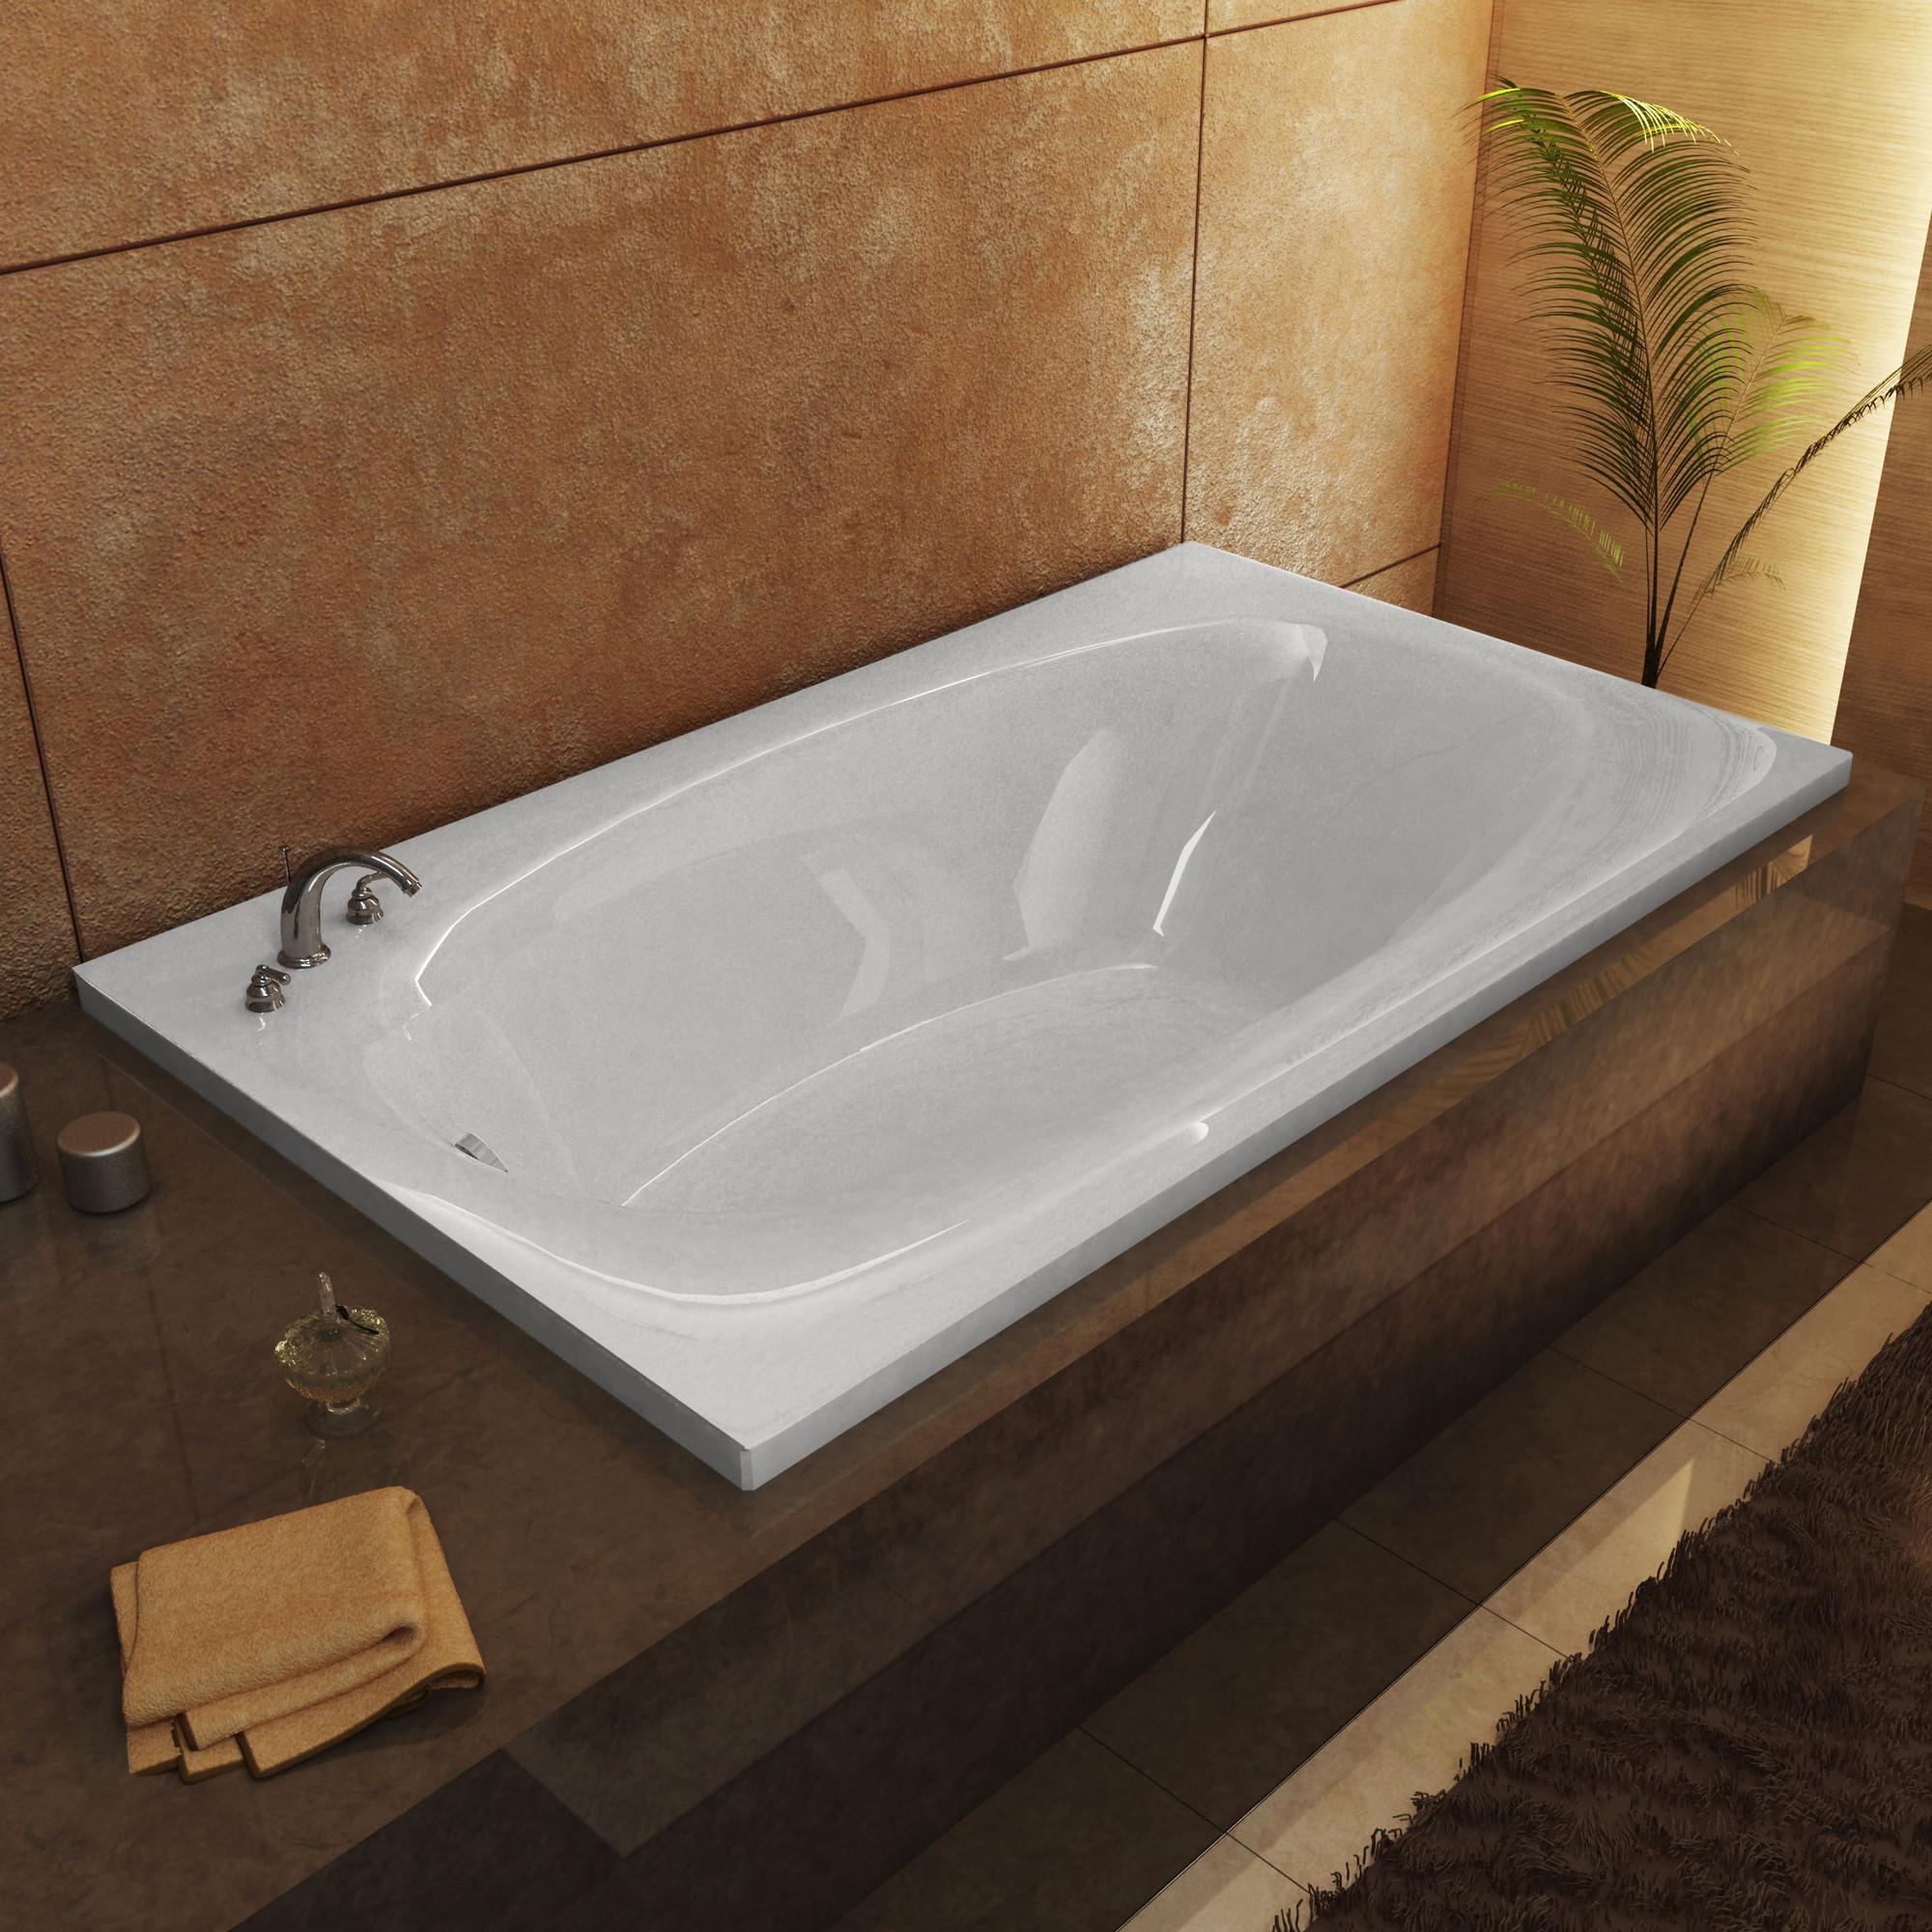 MediTub 4266P Atlantis Polaris Soaking Bathtub With Reversible Drain